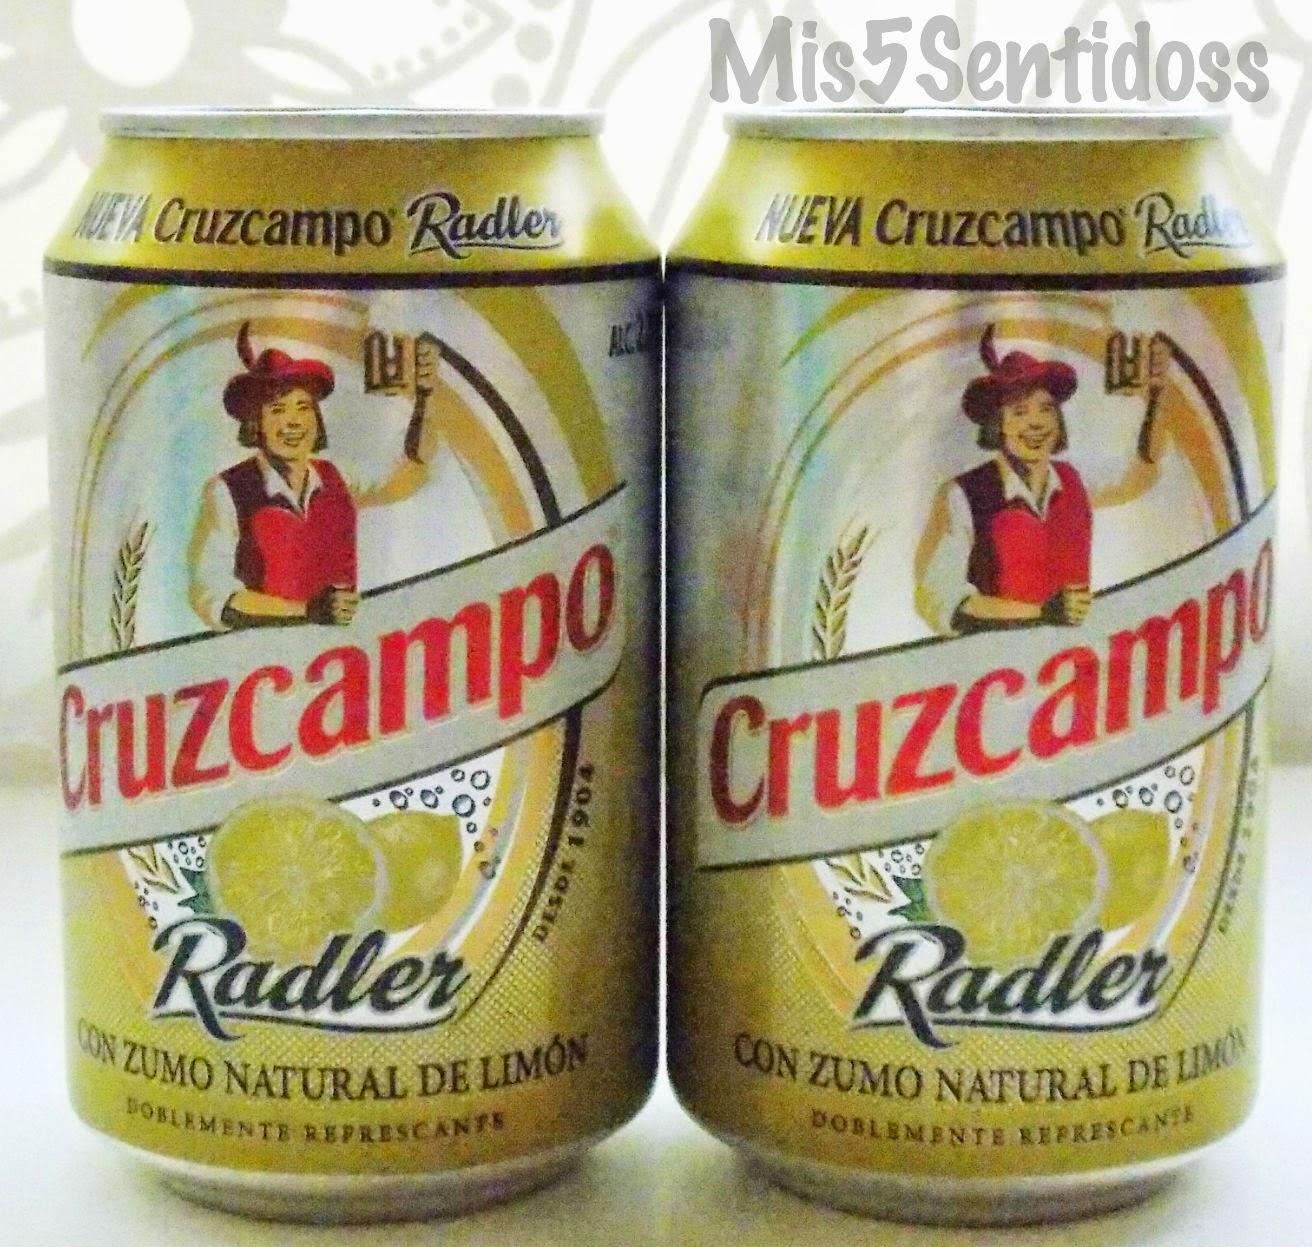 Degustabox agosto 2014 Cruzcampo Radler